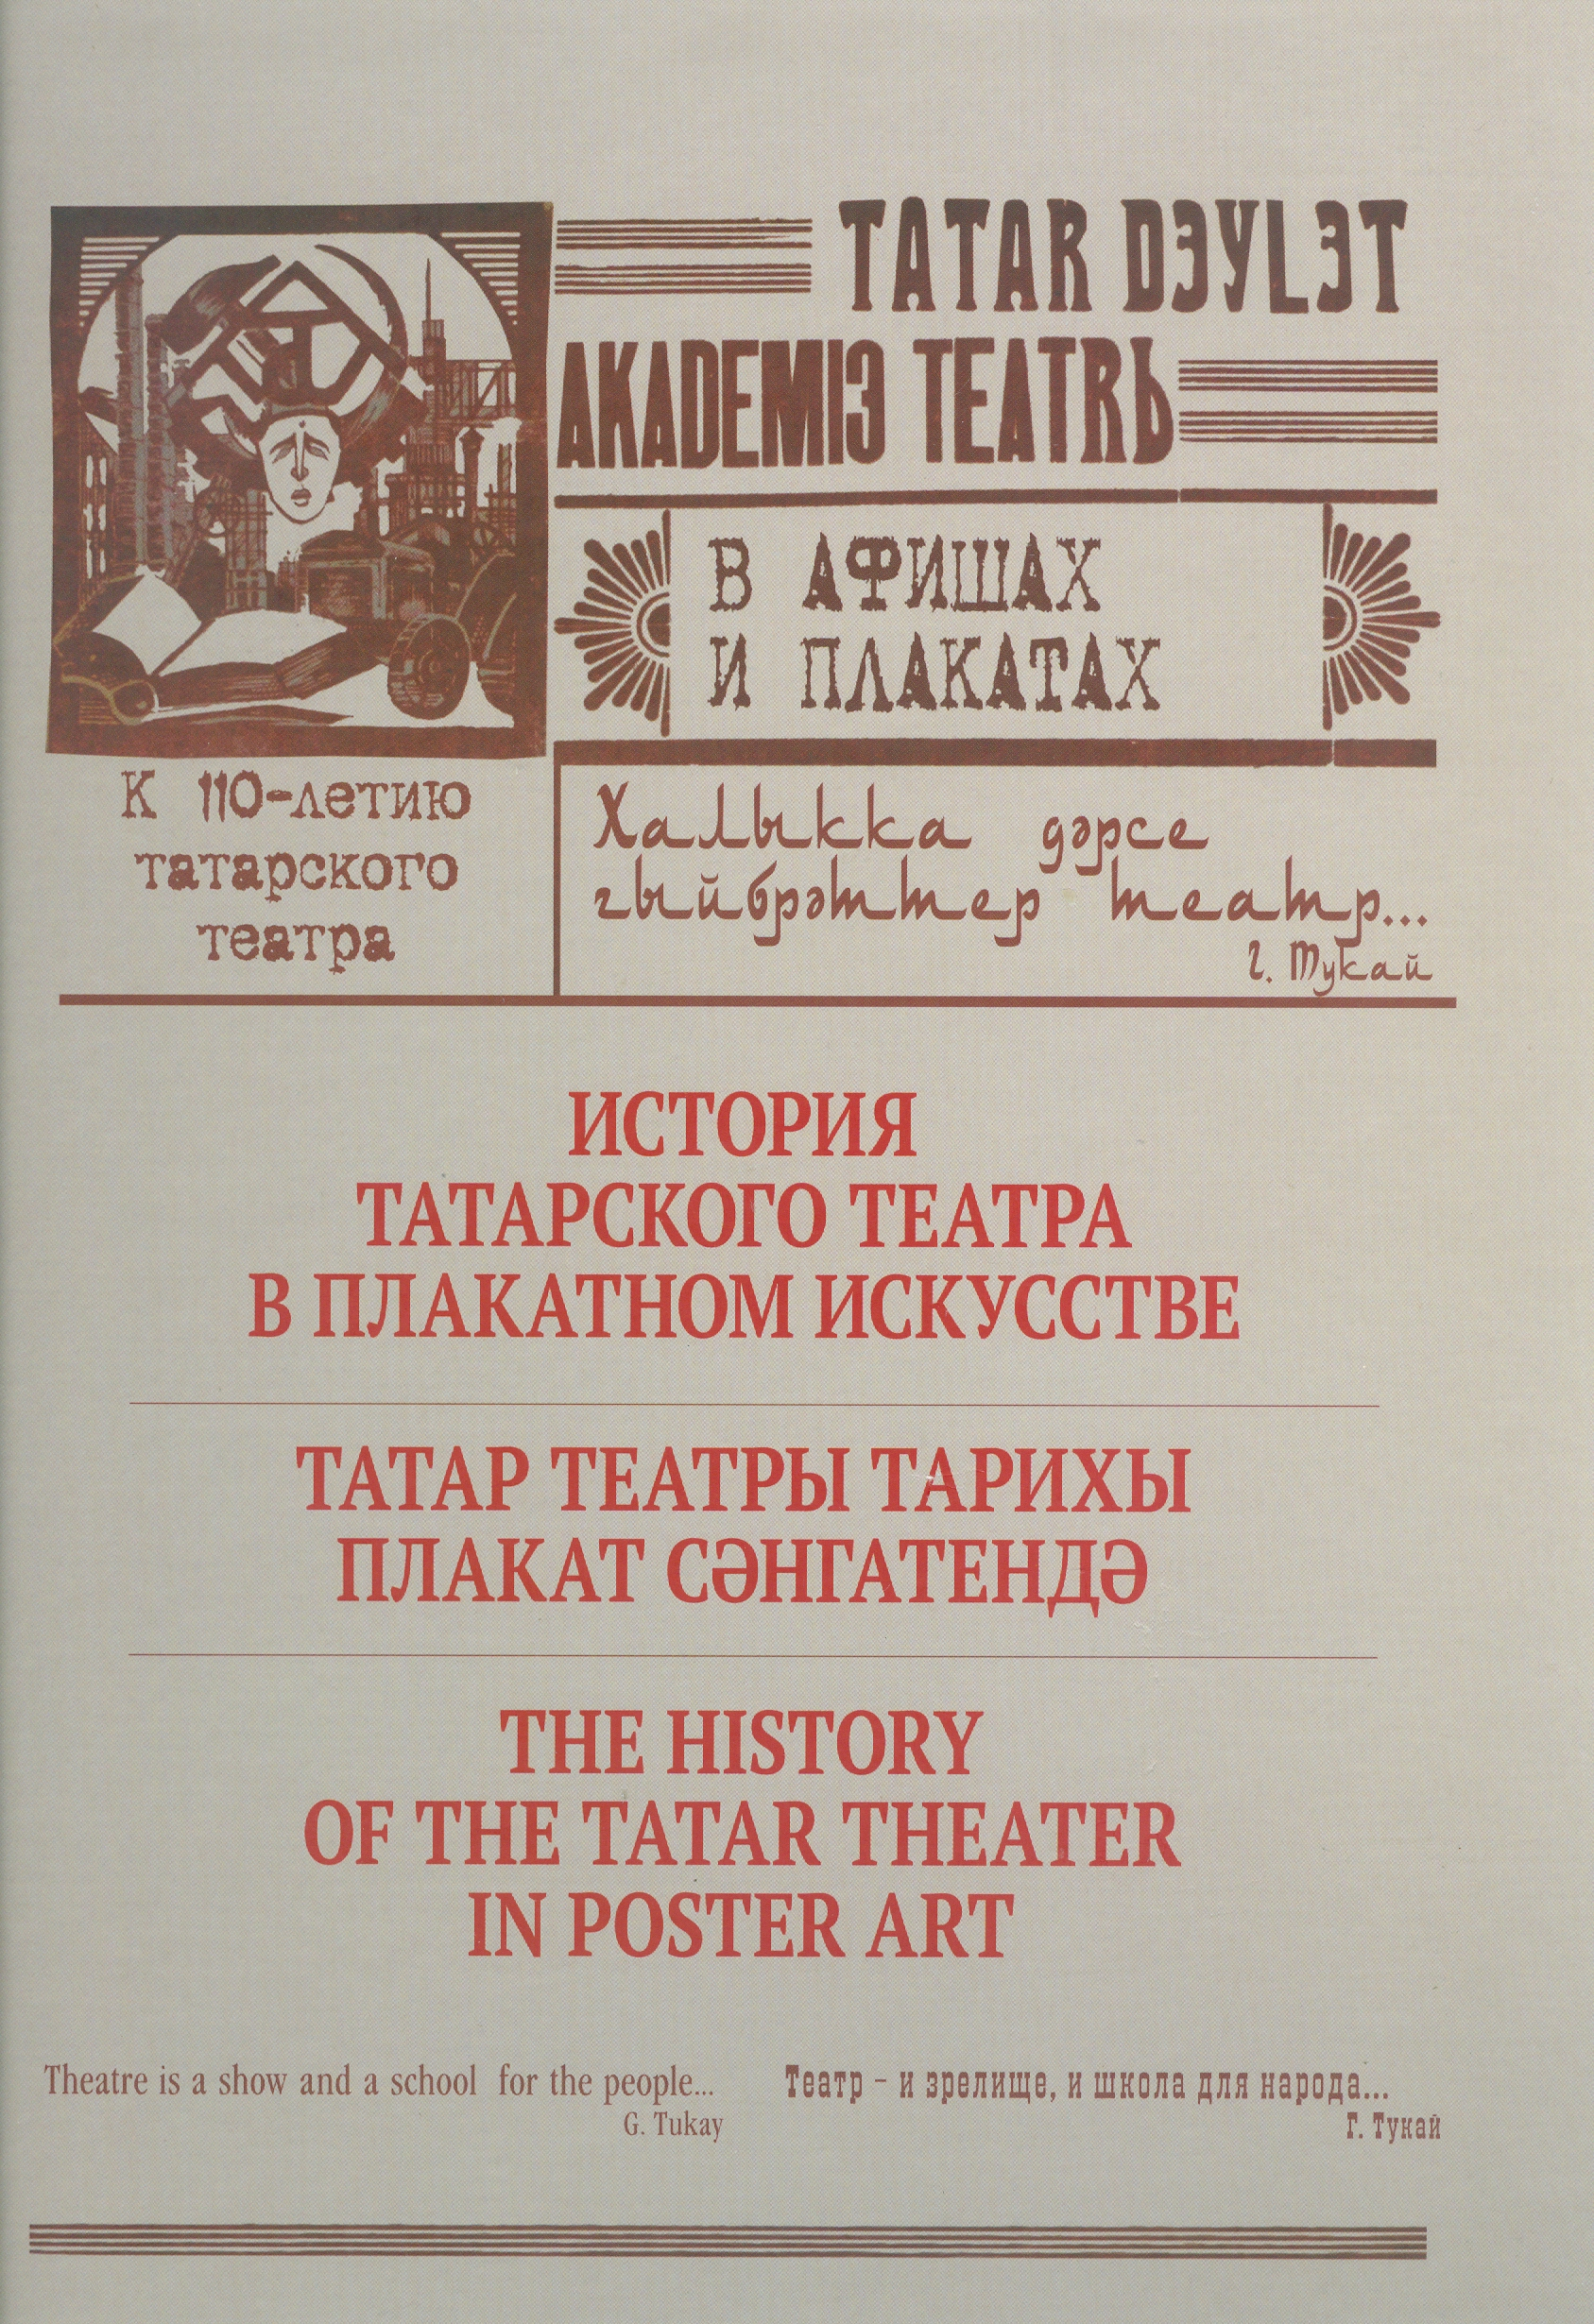 обложка татарский театр0001.jpg